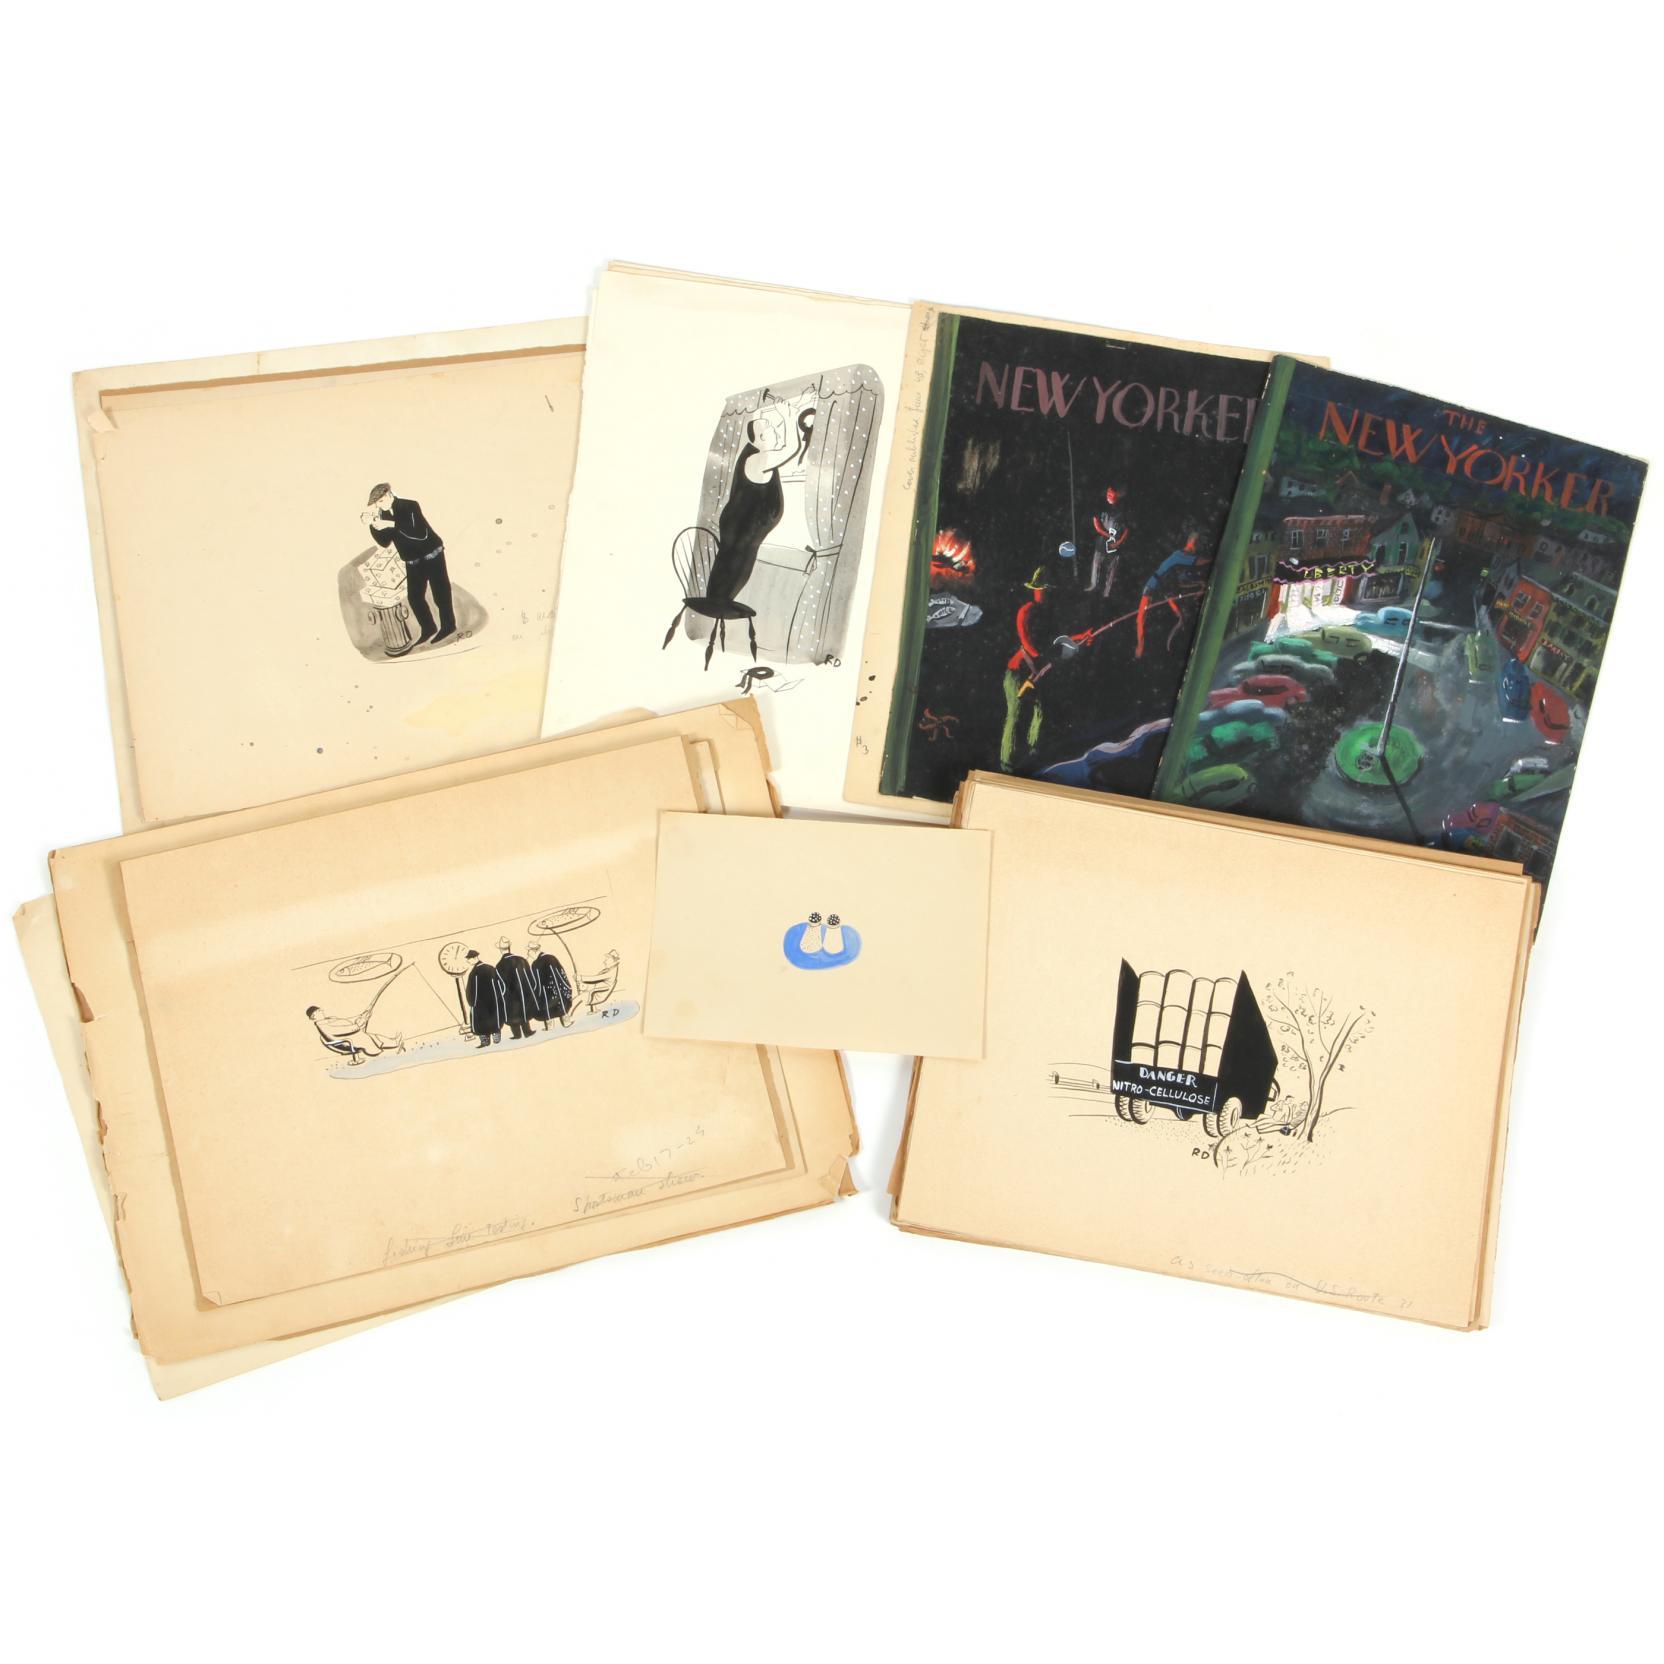 roger-duvoisin-1904-1980-an-archive